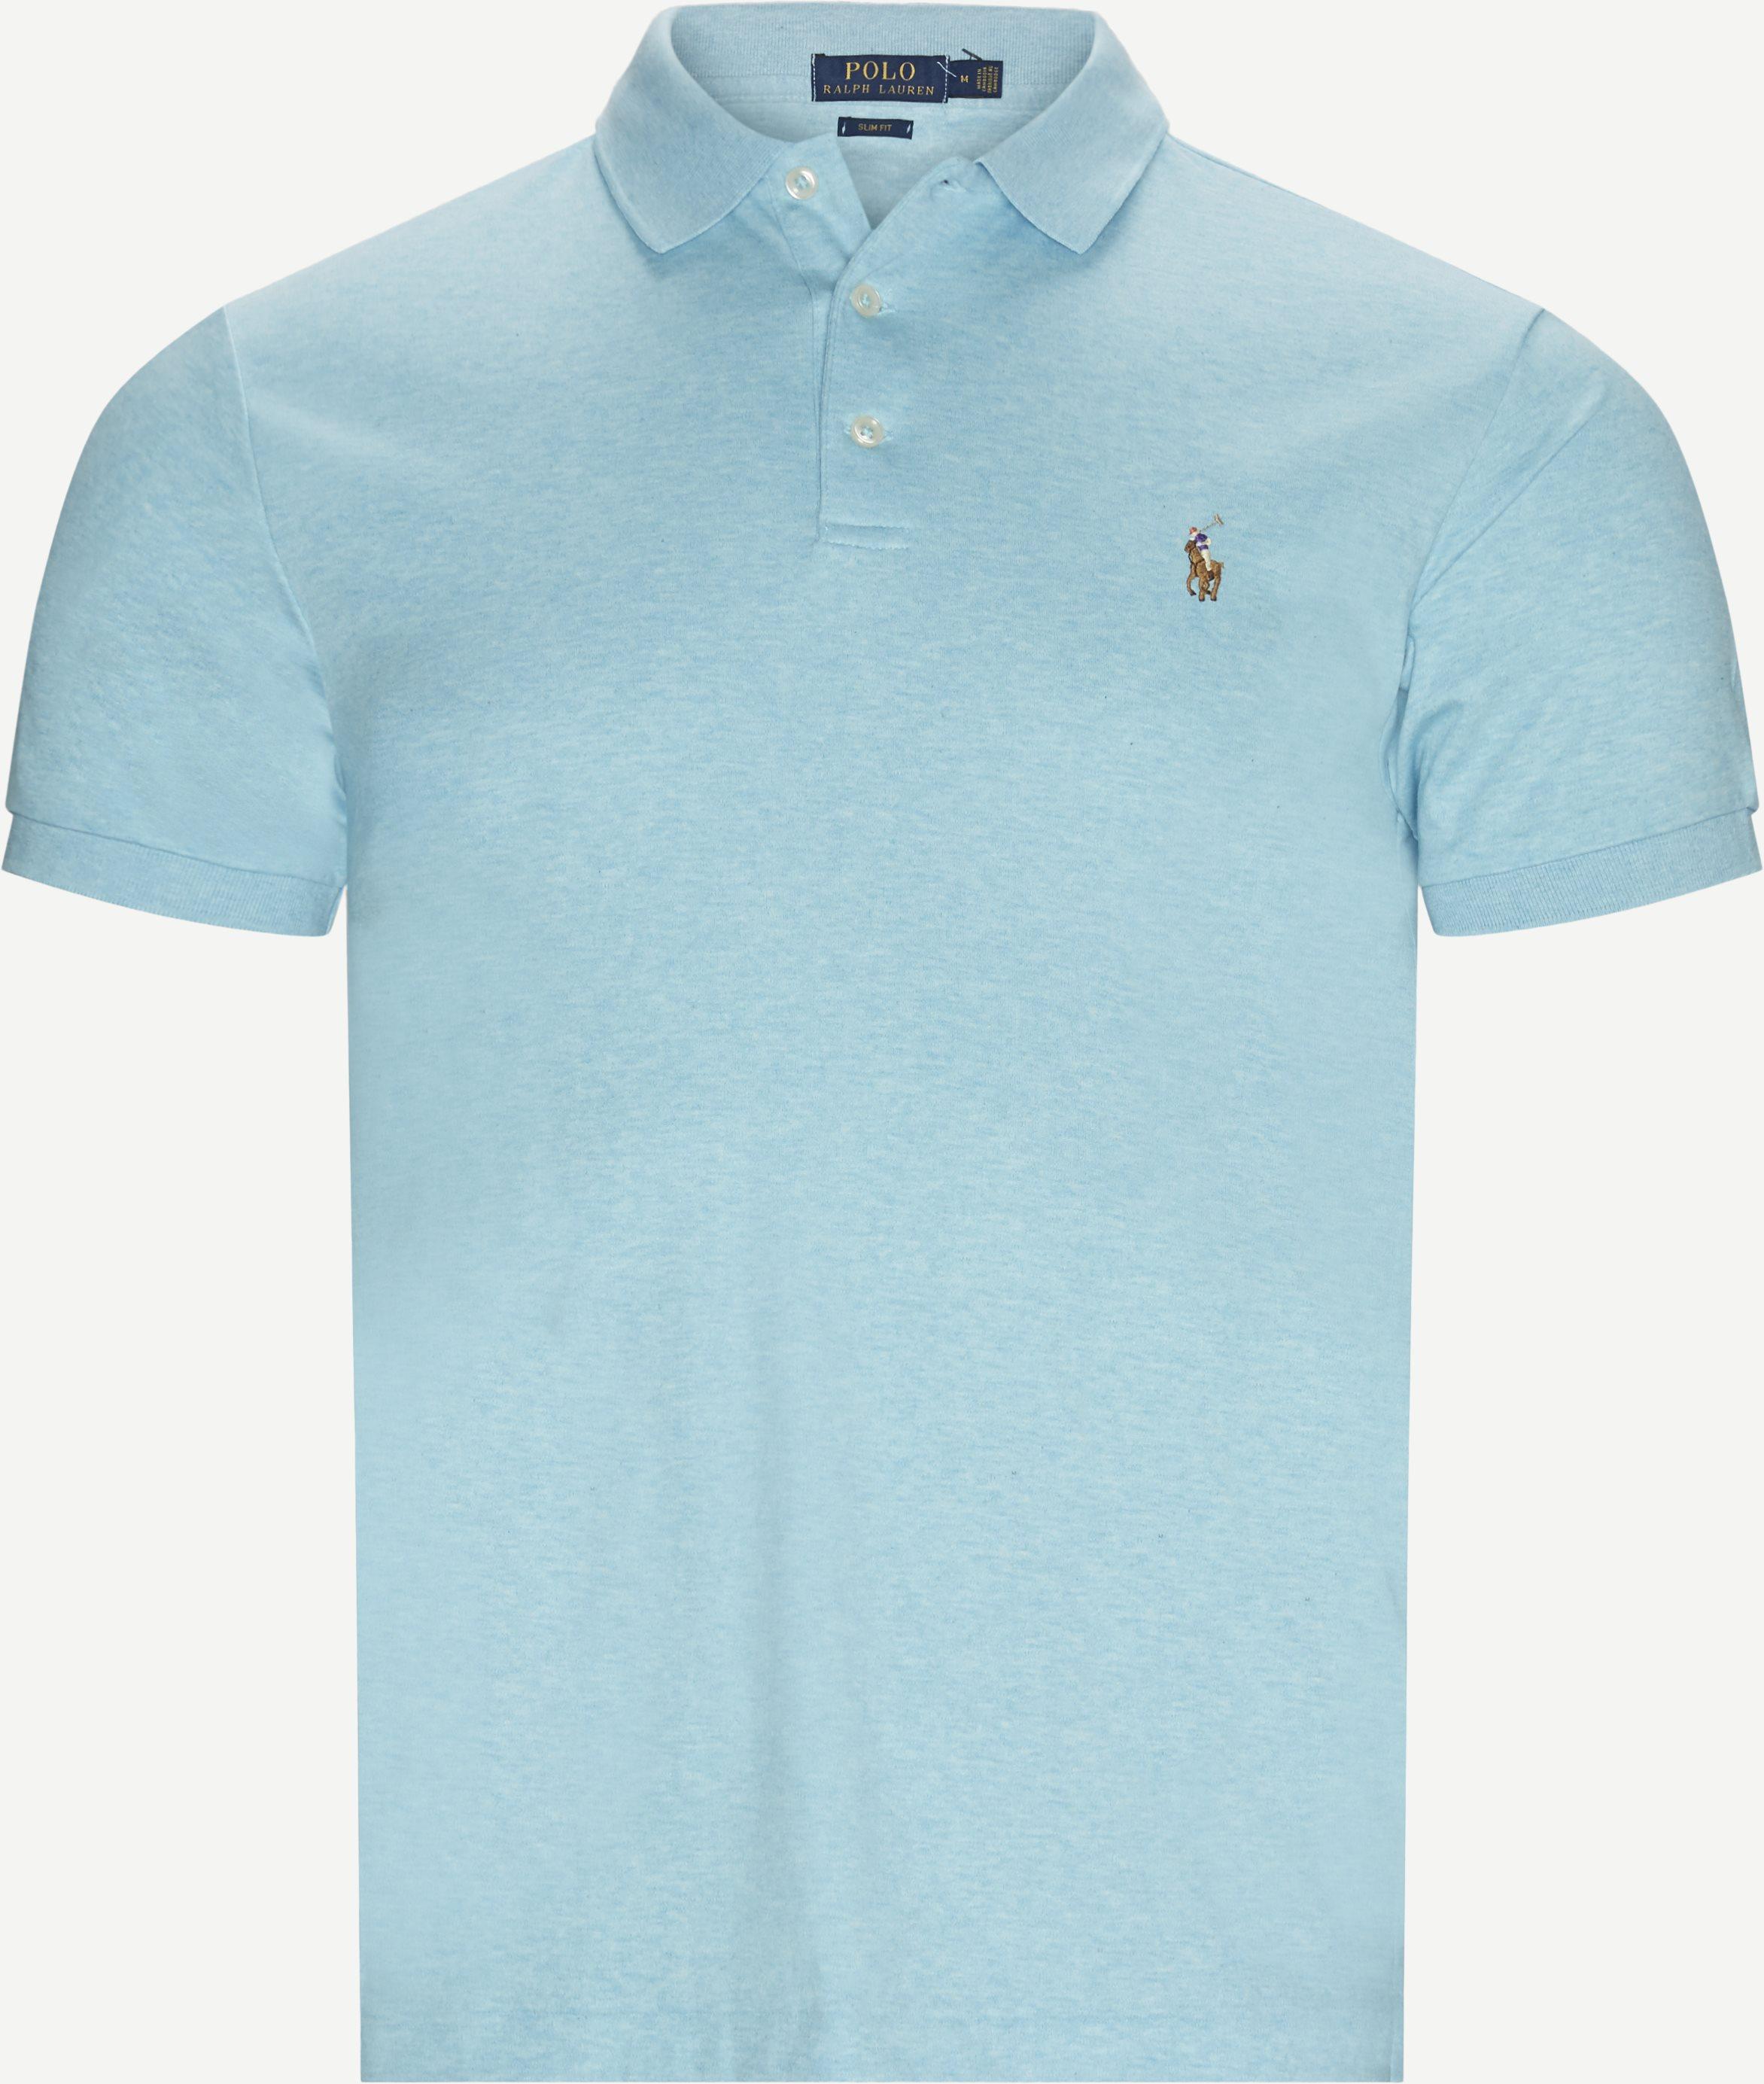 T-Shirts - Regular slim fit - Türkis